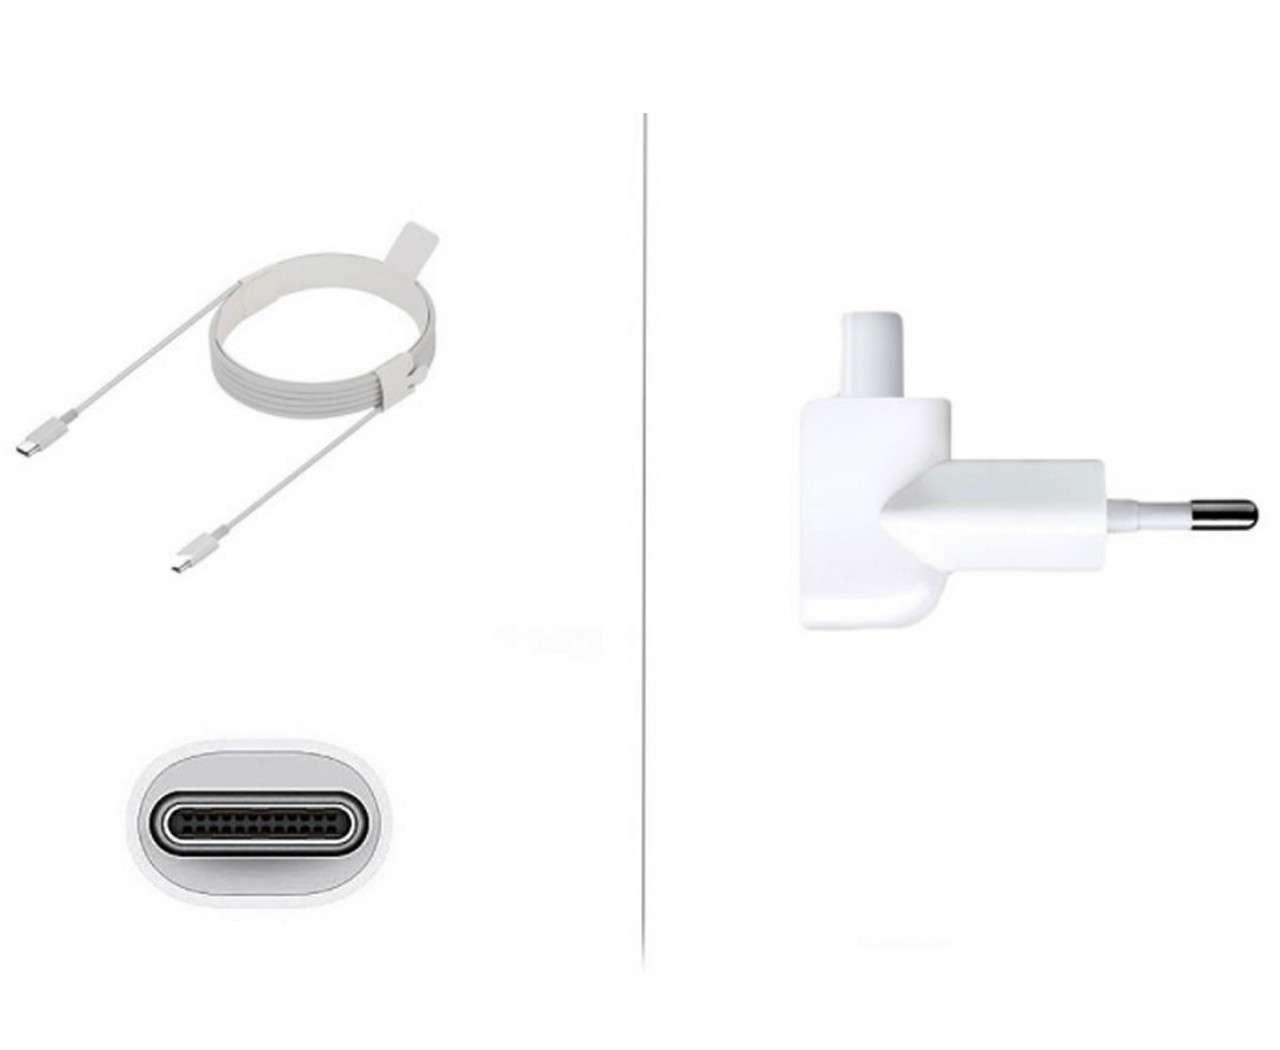 Incarcator Apple MacBook 12 A1534 imagine powerlaptop.ro 2021